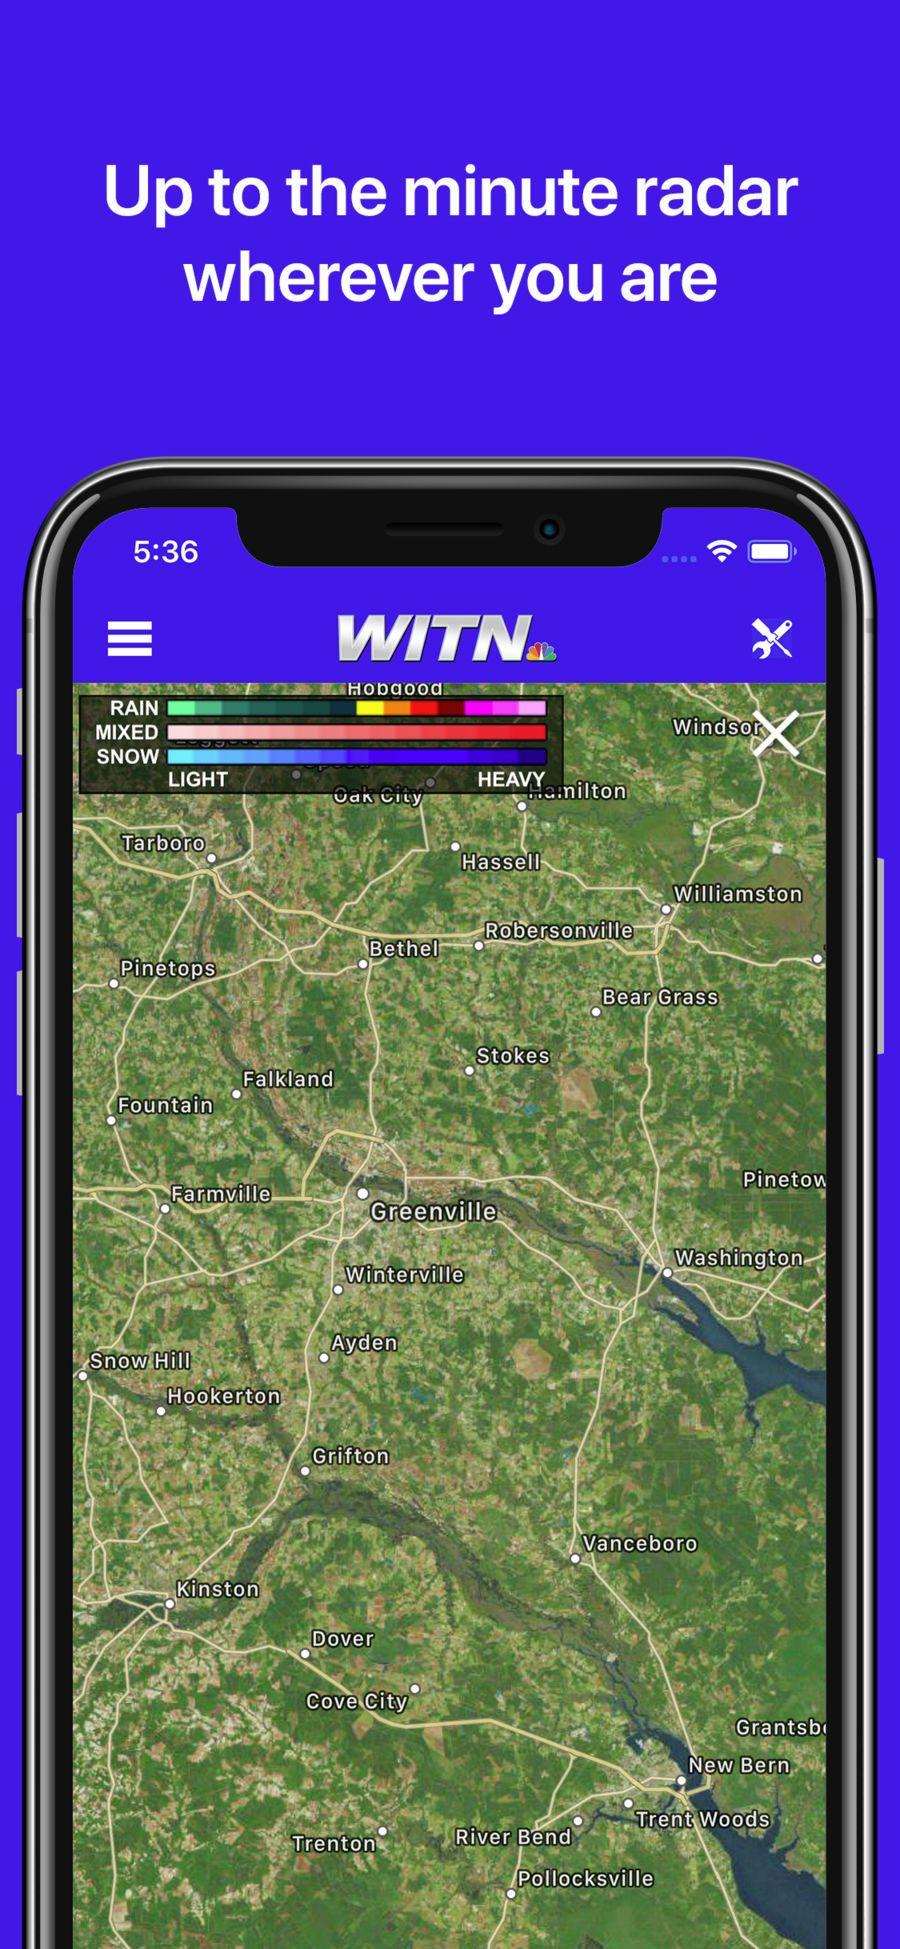 WITN News WeatherGroupappsios Cove city, Ios apps, App